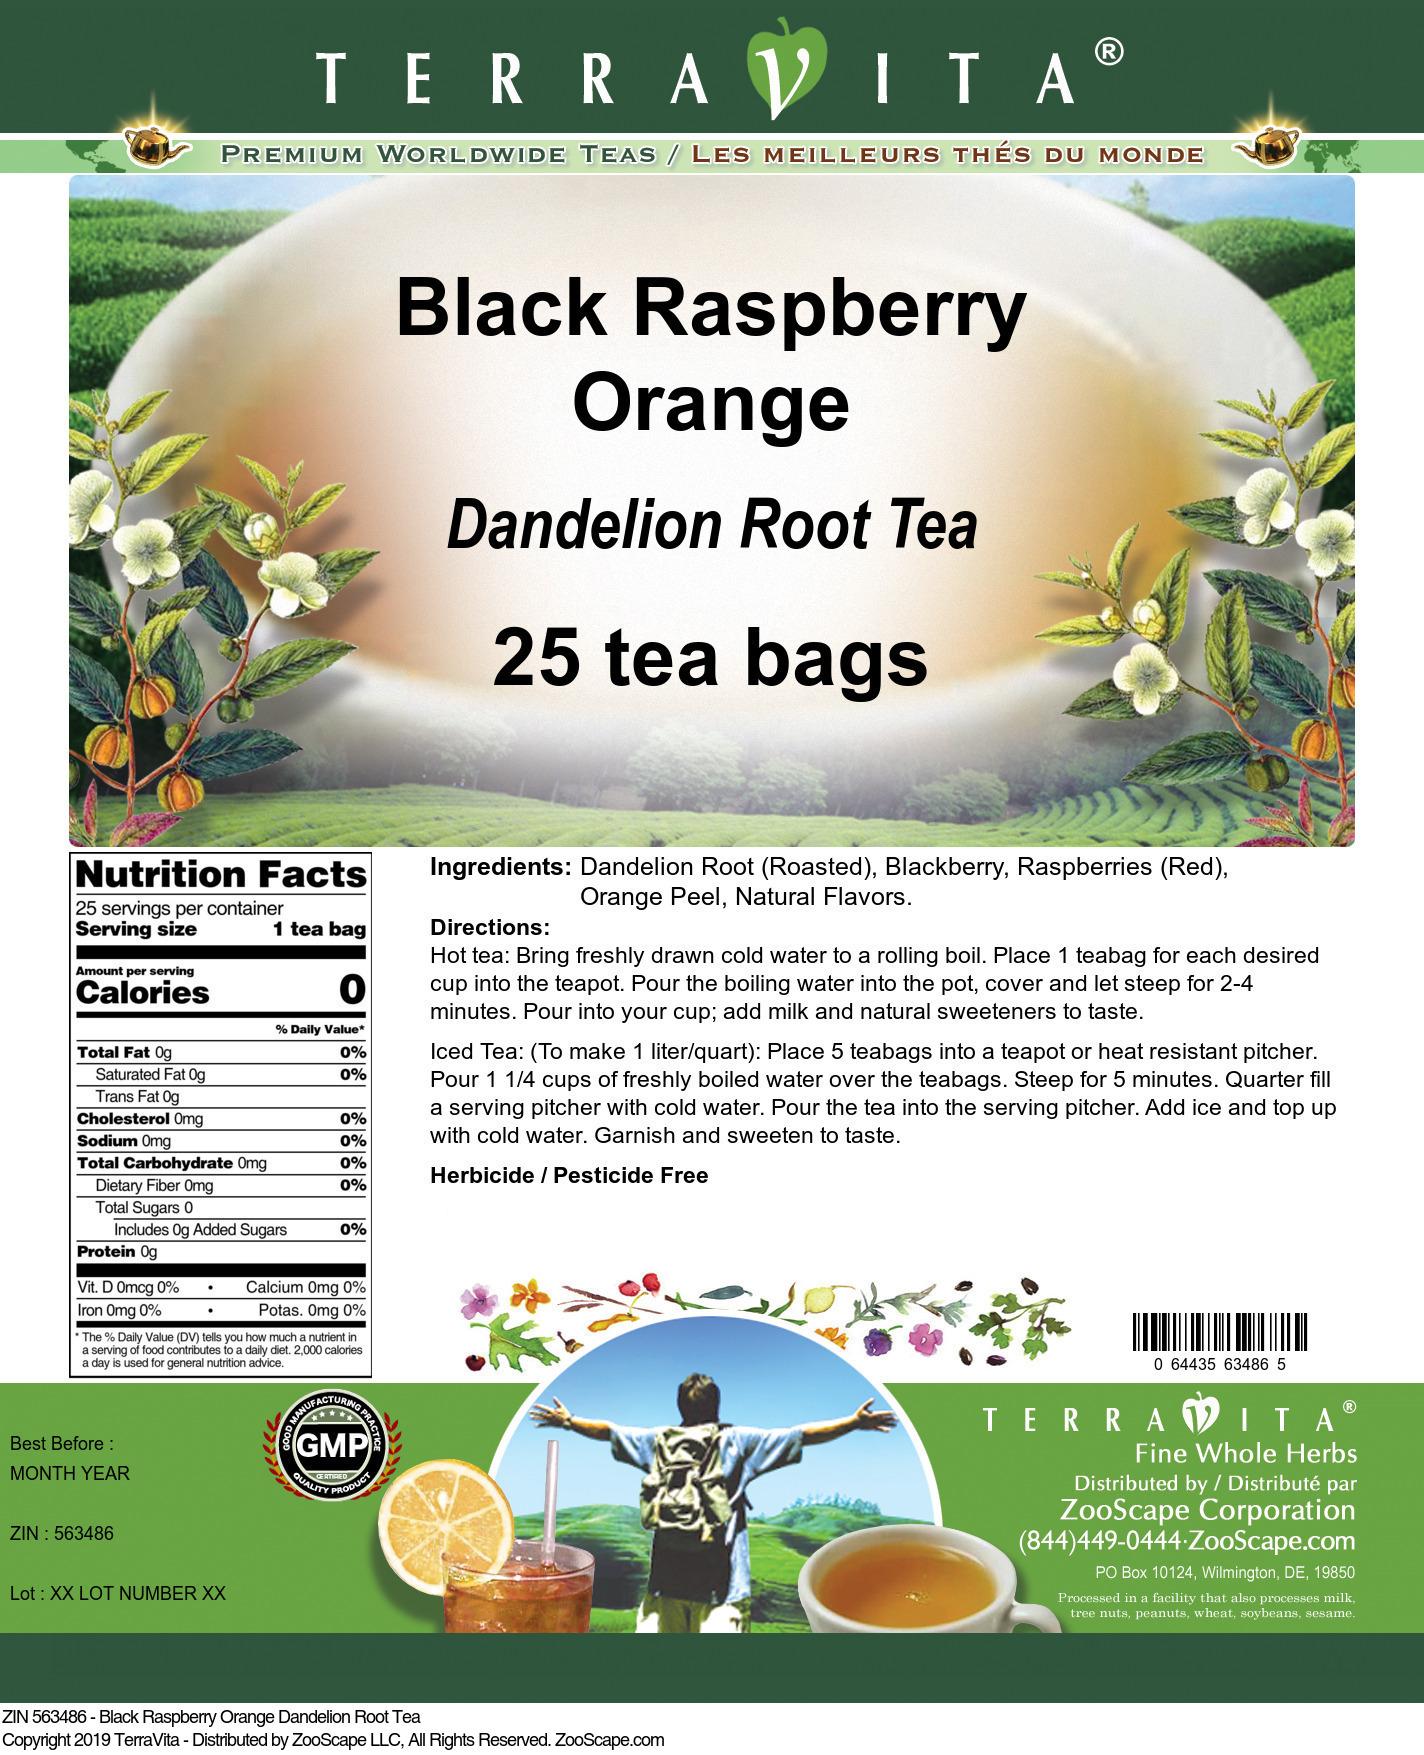 Black Raspberry Orange Dandelion Root Tea